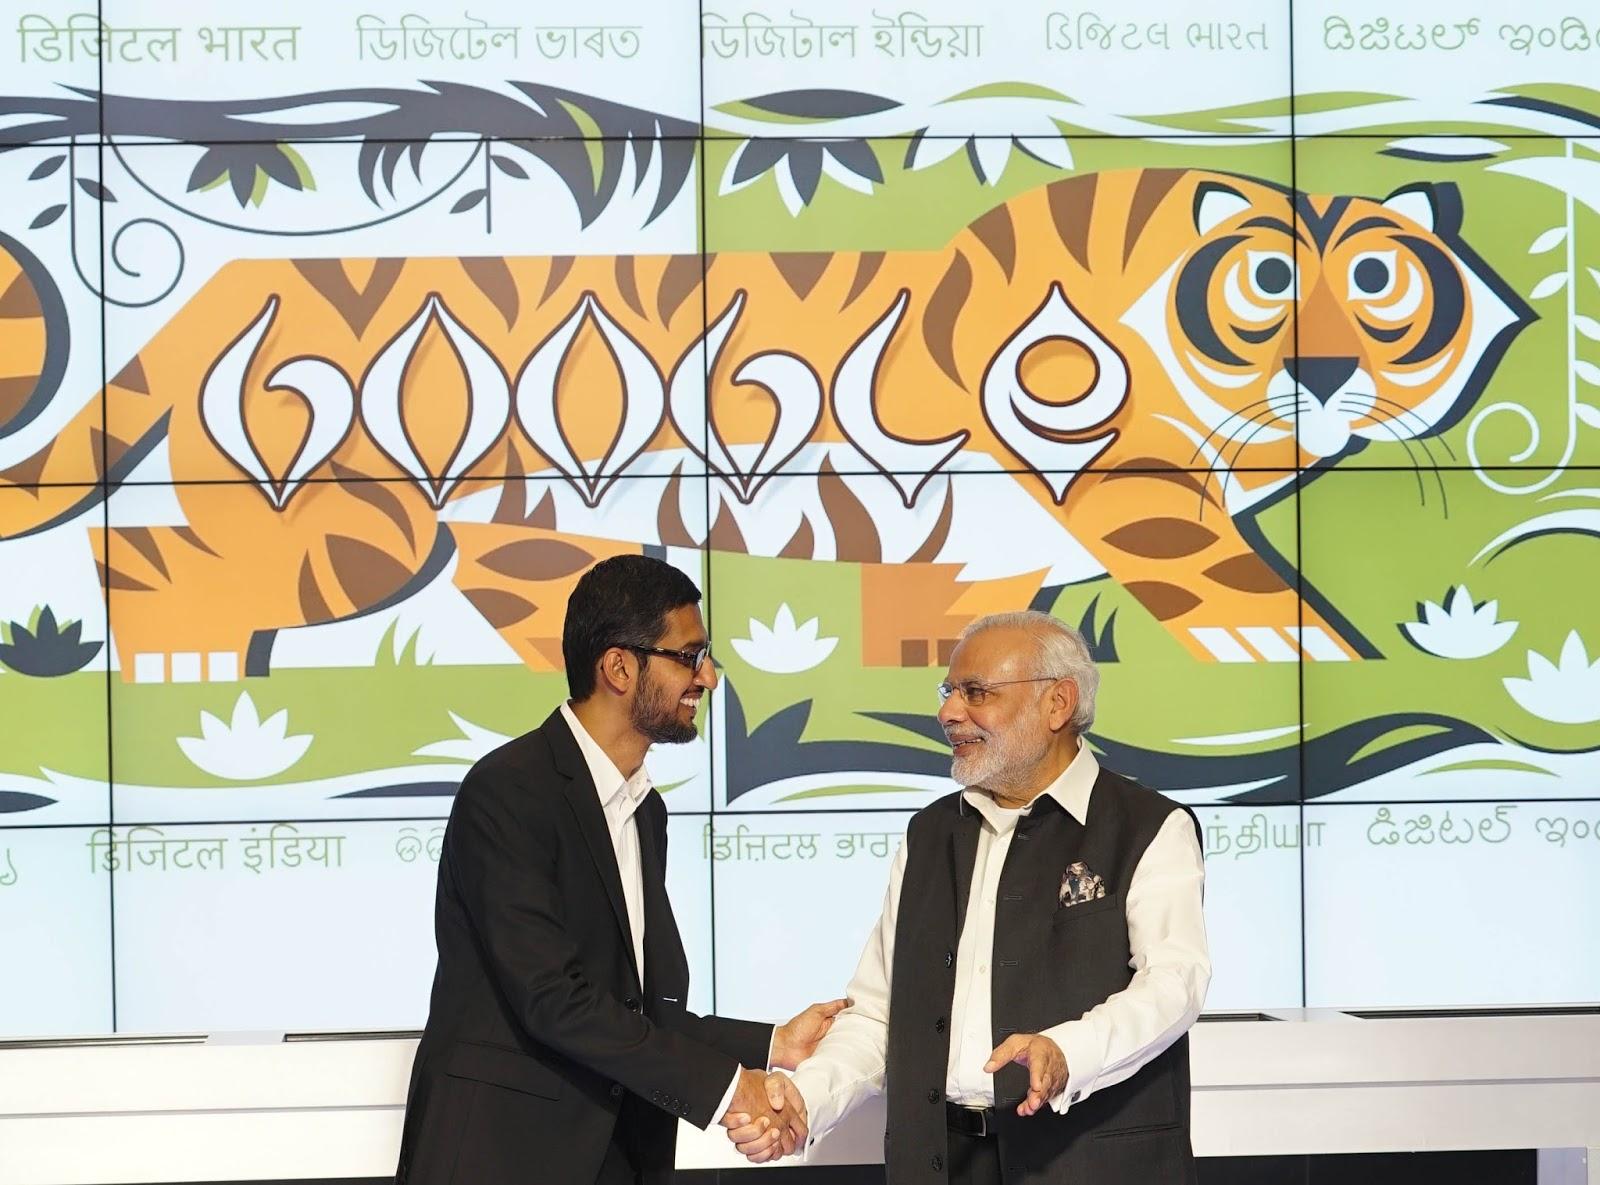 Google plans to bring one billion more Indians online